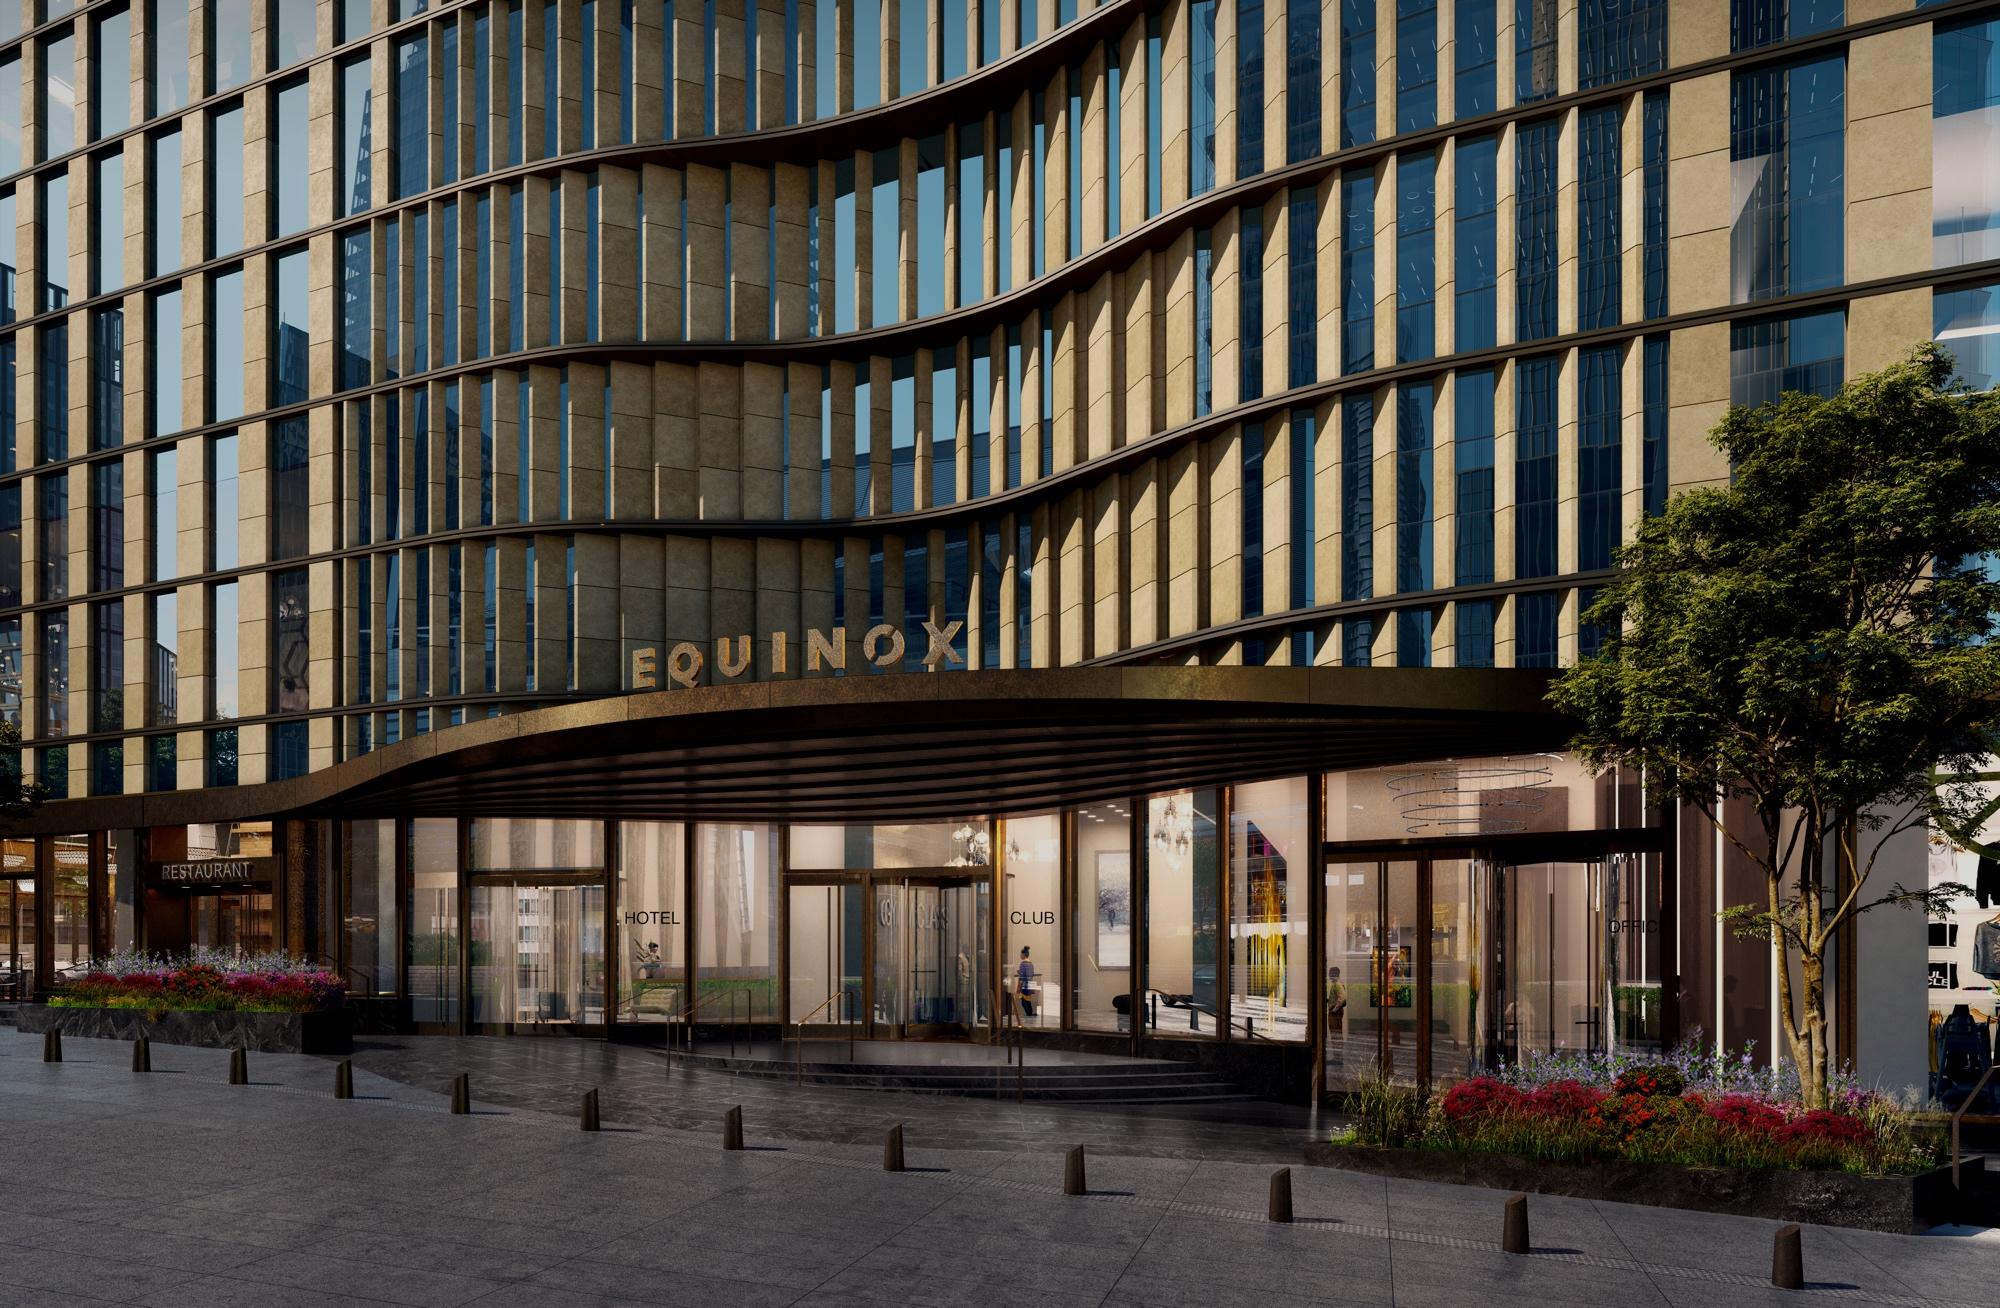 Equinox Hotel in New York